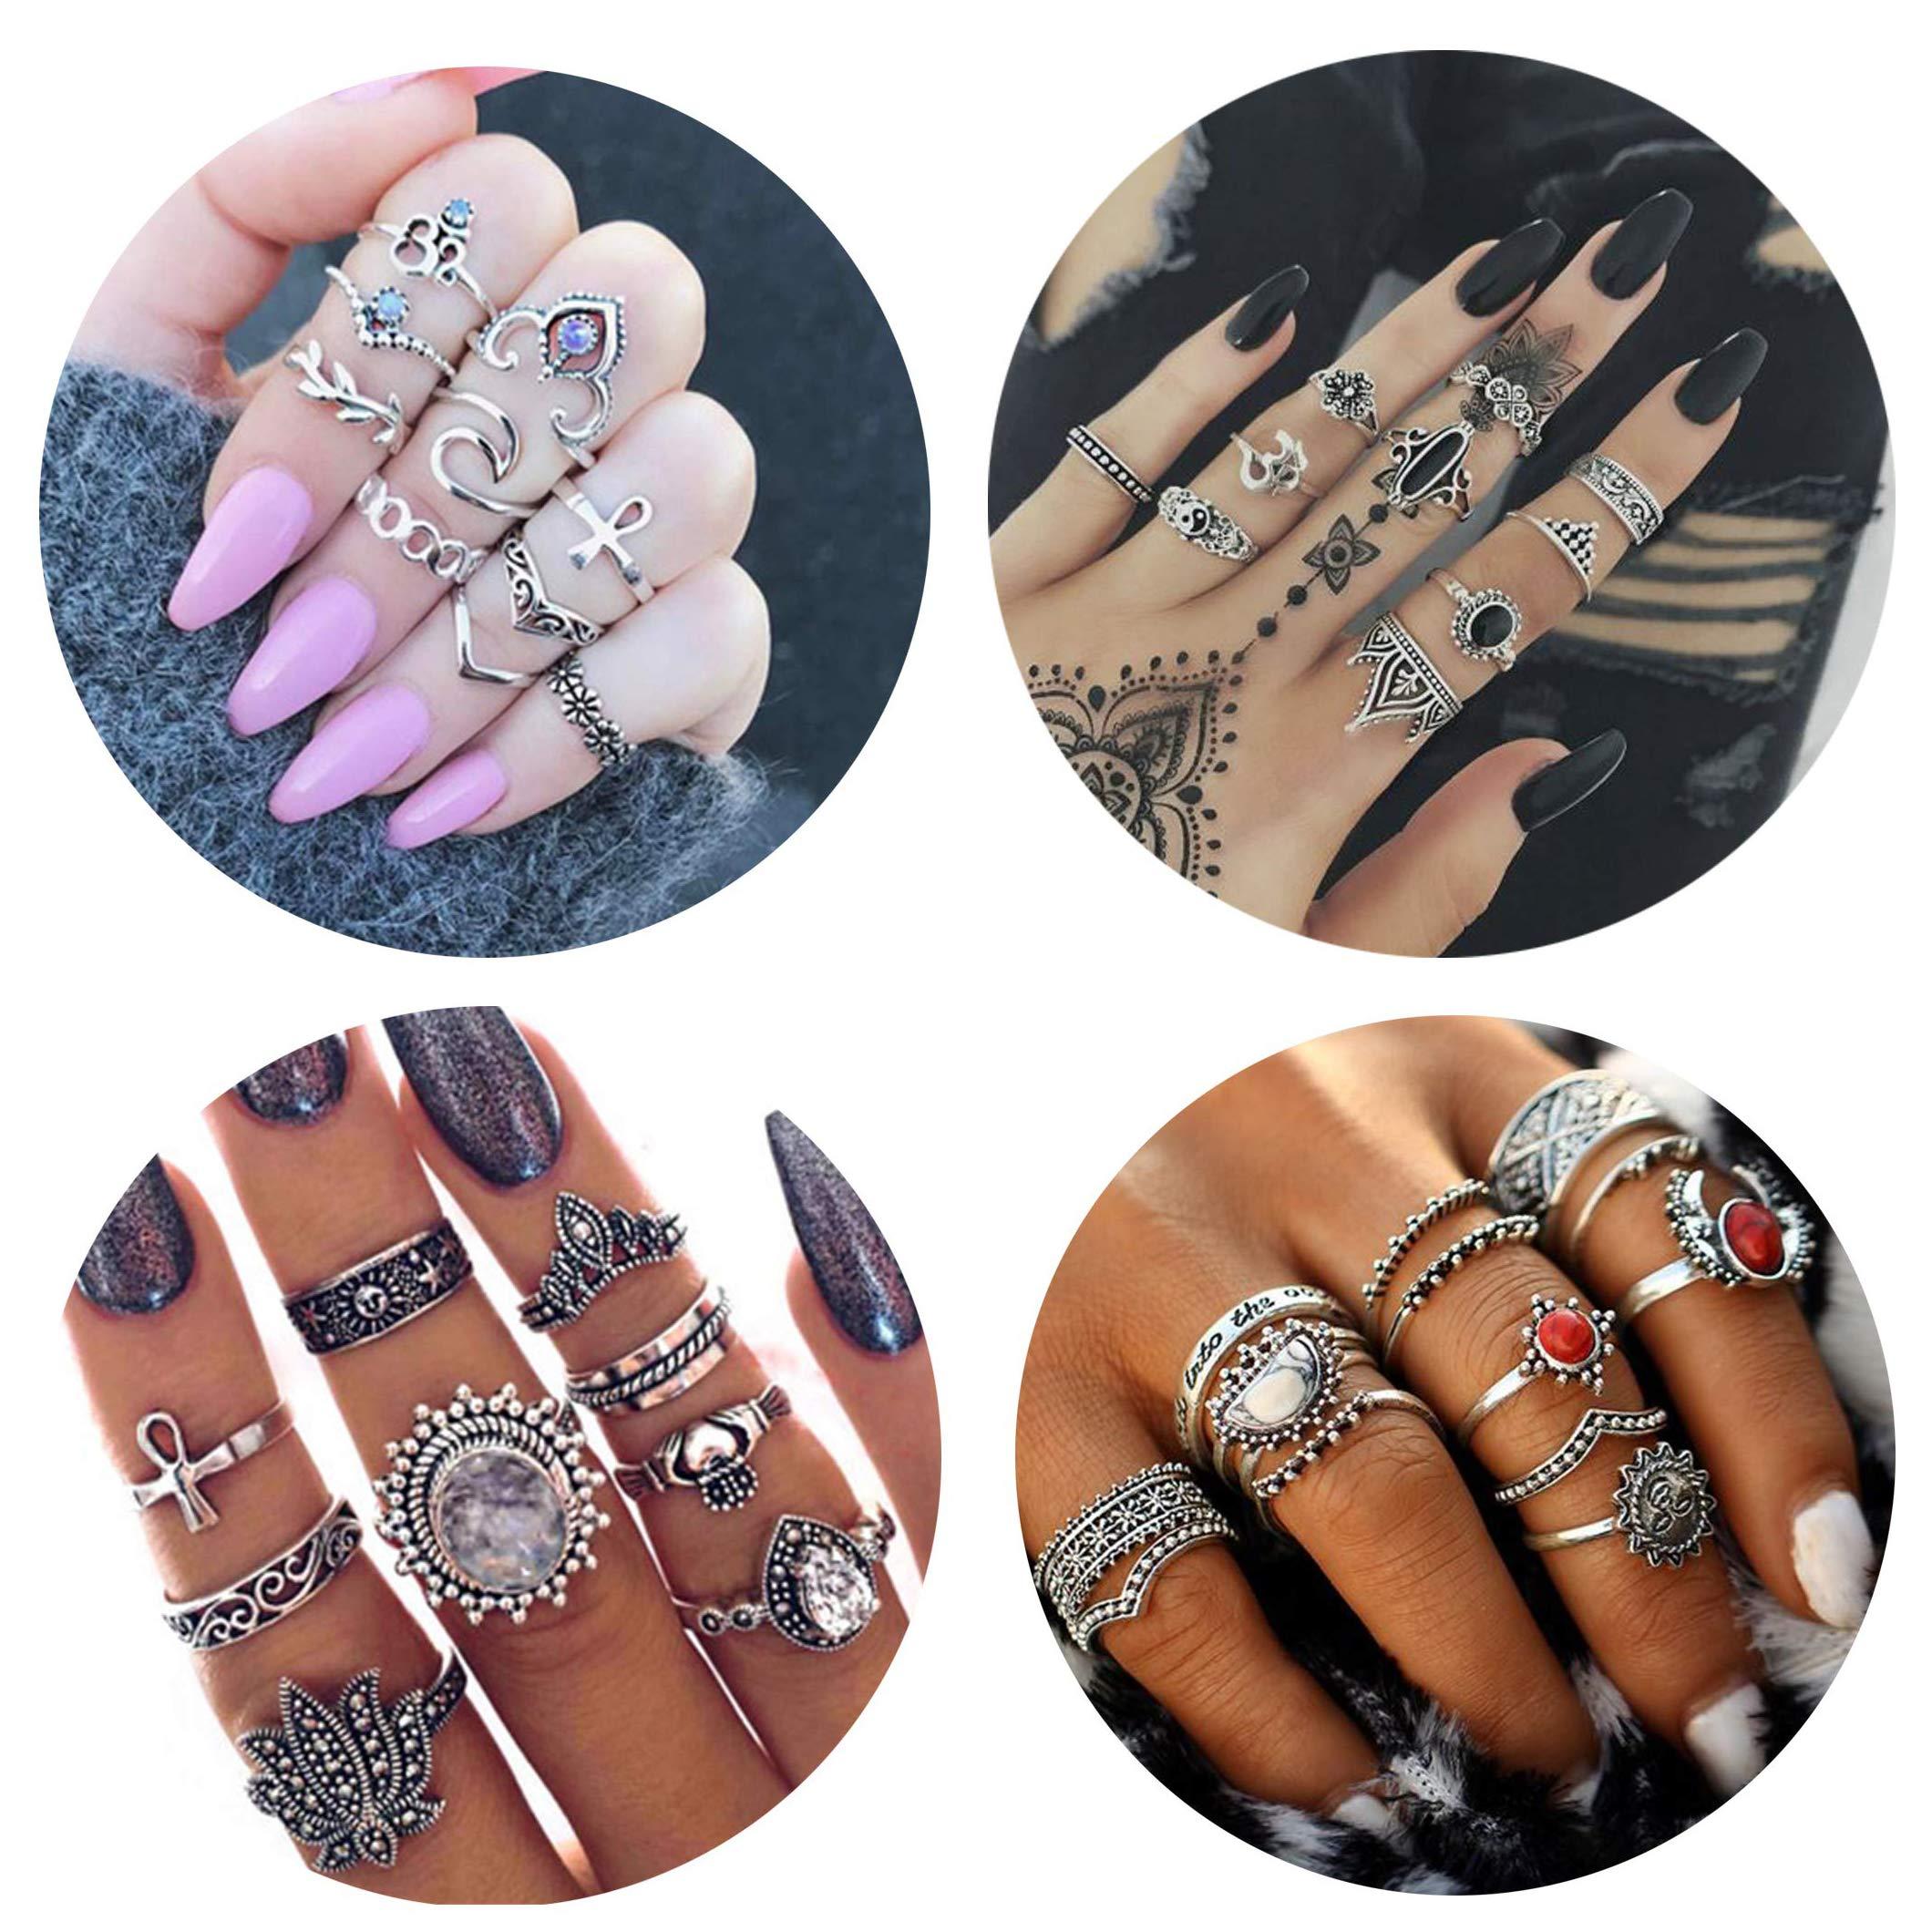 FIBO STEEL 42-63 Pcs Vintage Knuckle Rings for Women Girls Stackable Midi Finger Ring Set (A1: 42 Pcs a Set)